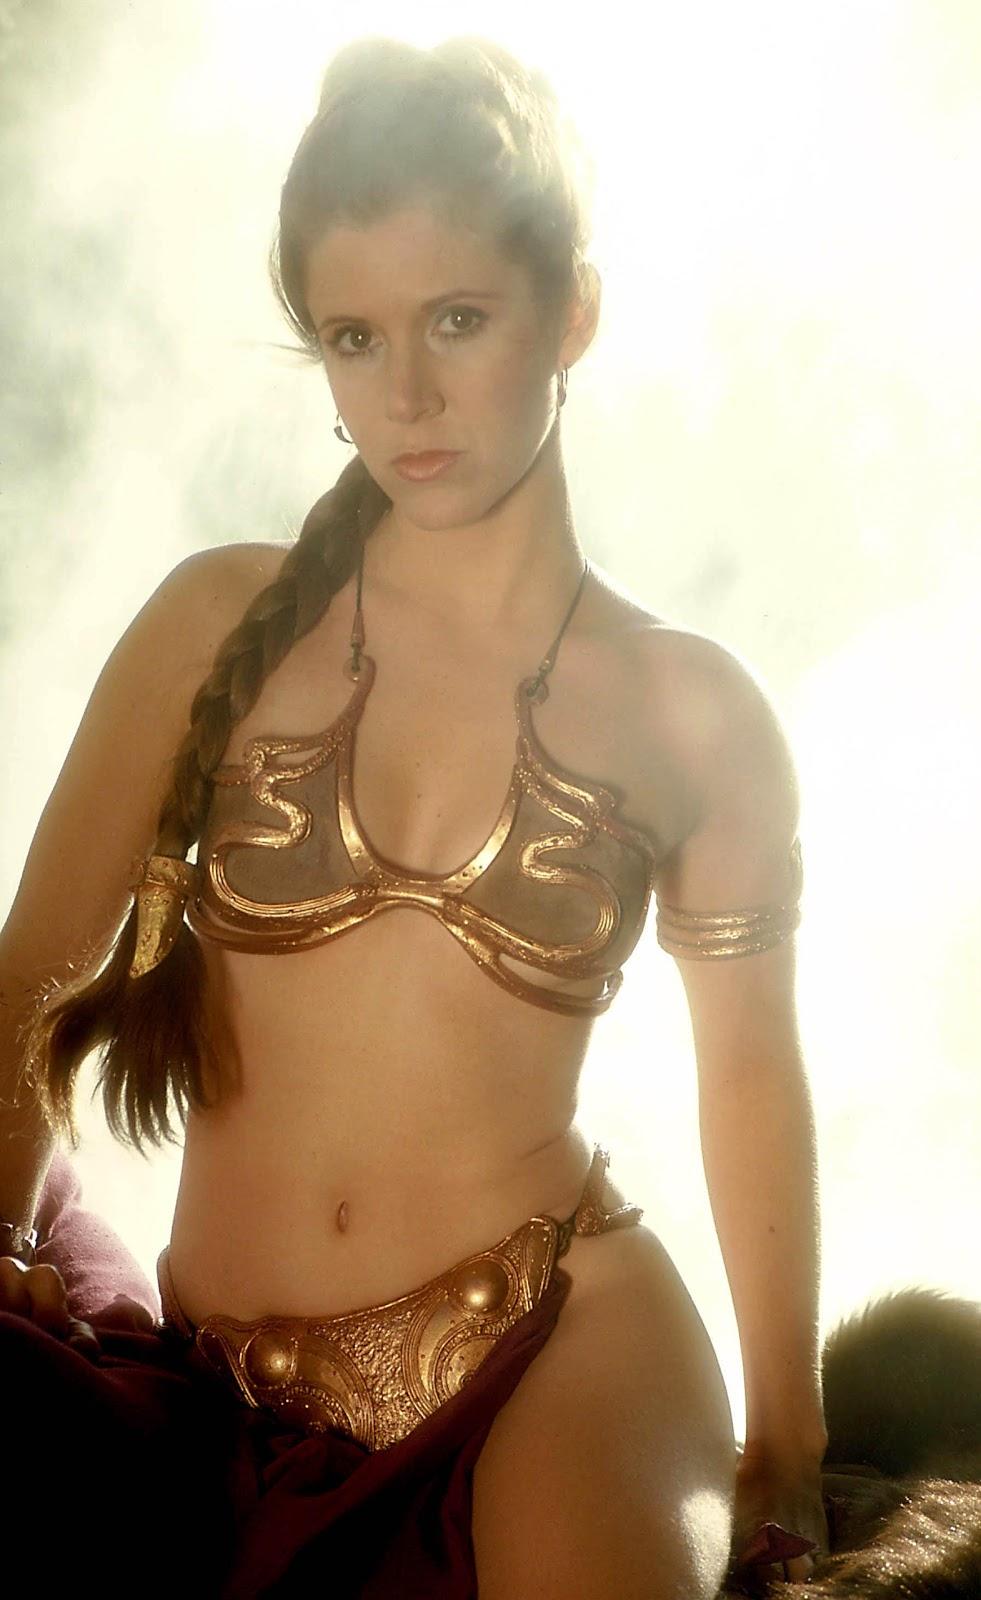 Carrie Fisher as Princess Leia Organa - Hot Celebrities